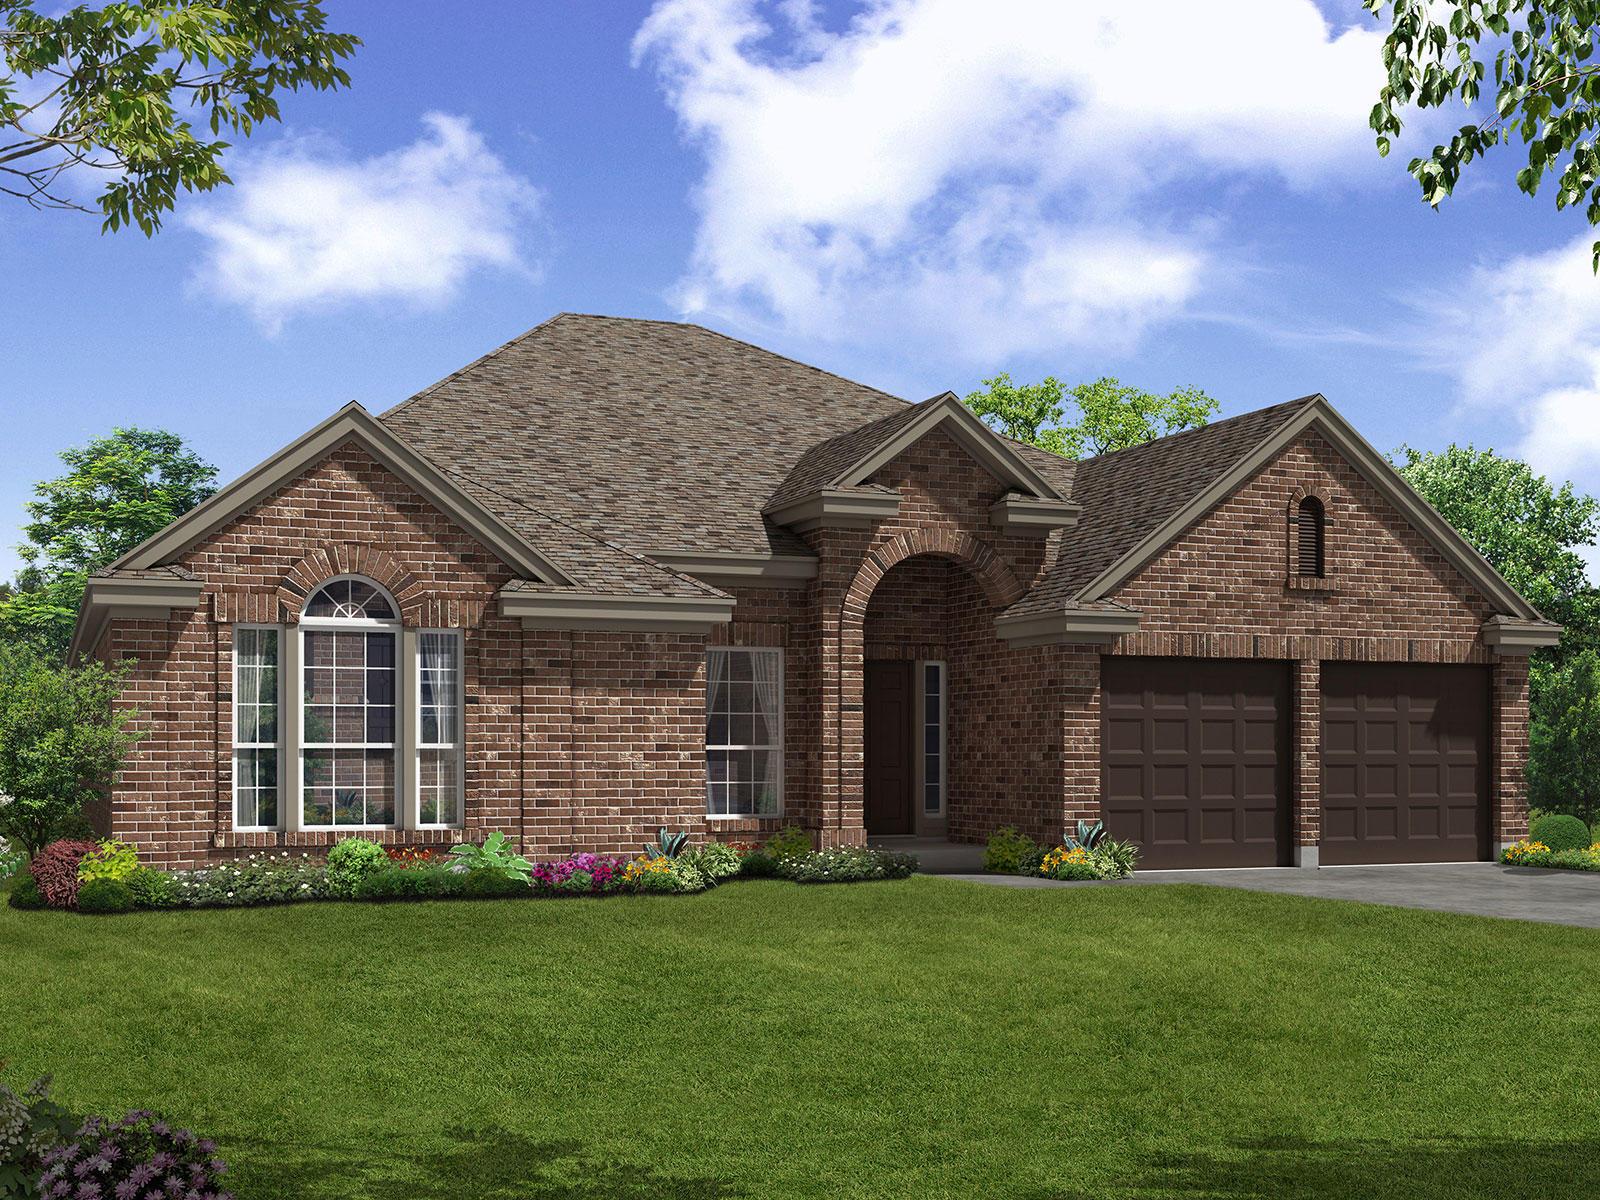 The Devonshire (6891) Plan, Houston, TX 77089 - 4 Bed, 2 Bath Single-Family  Home - 7 Photos   Trulia